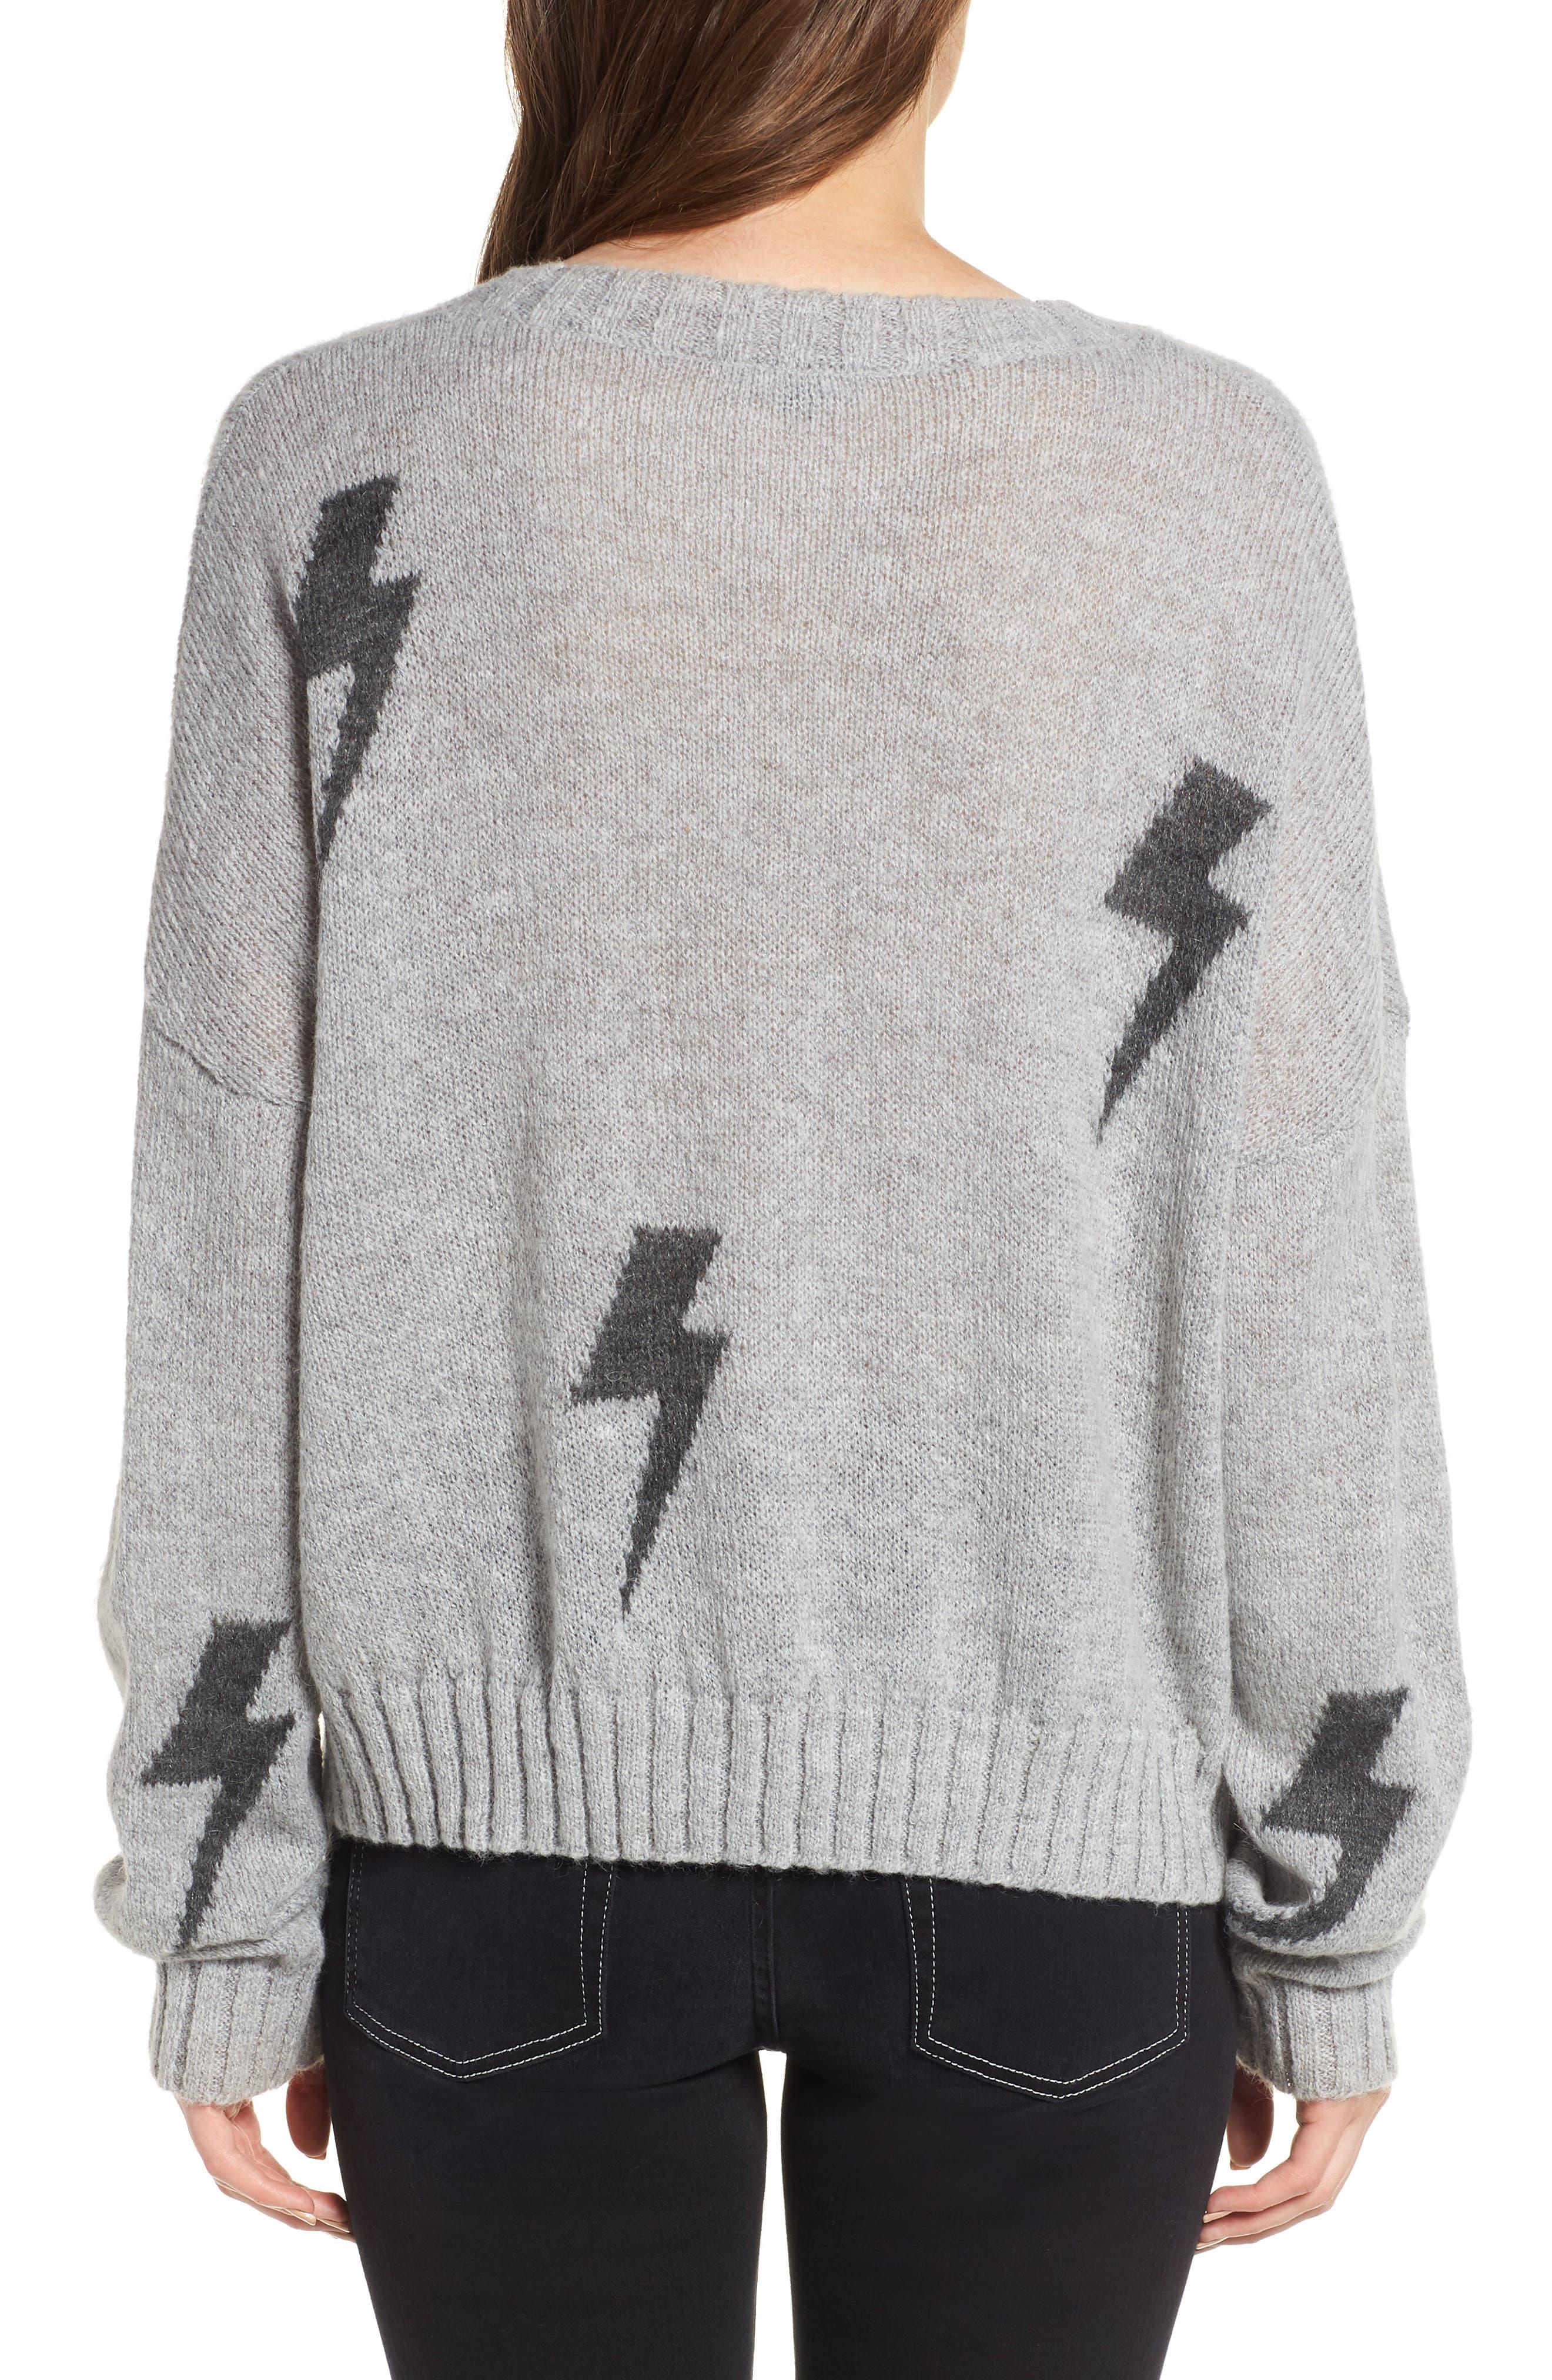 Perci Sweater,                             Alternate thumbnail 3, color,                             GREY/CHARCOAL LIGHTNING